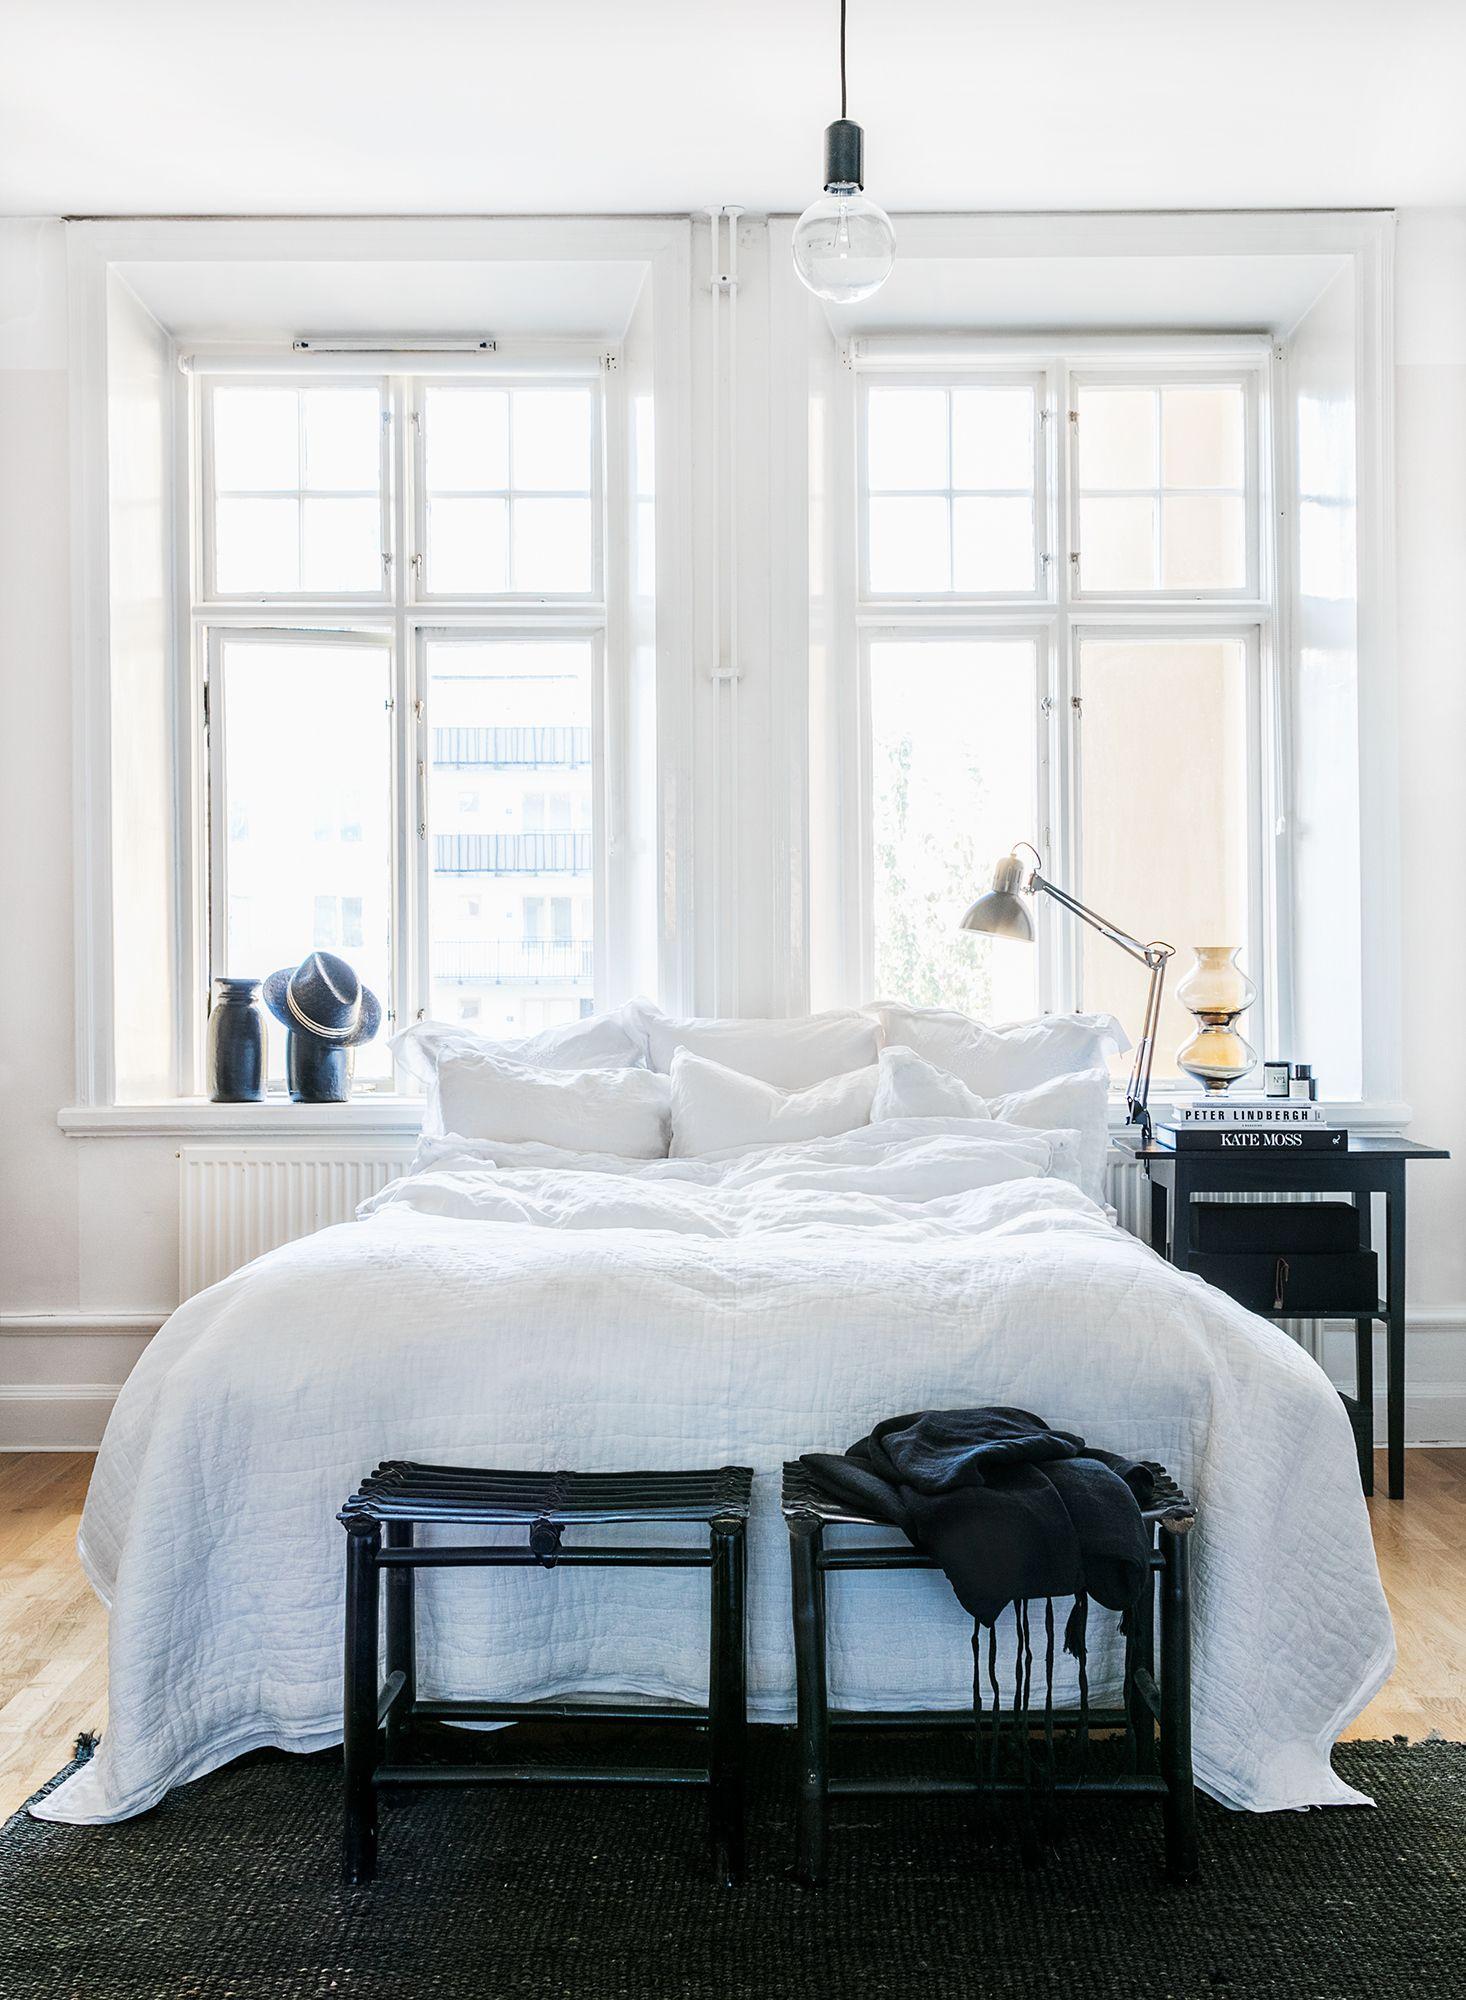 die besten 25 ikea kissenbezug ideen auf pinterest wei e kissenbez ge kissenbezug designs. Black Bedroom Furniture Sets. Home Design Ideas